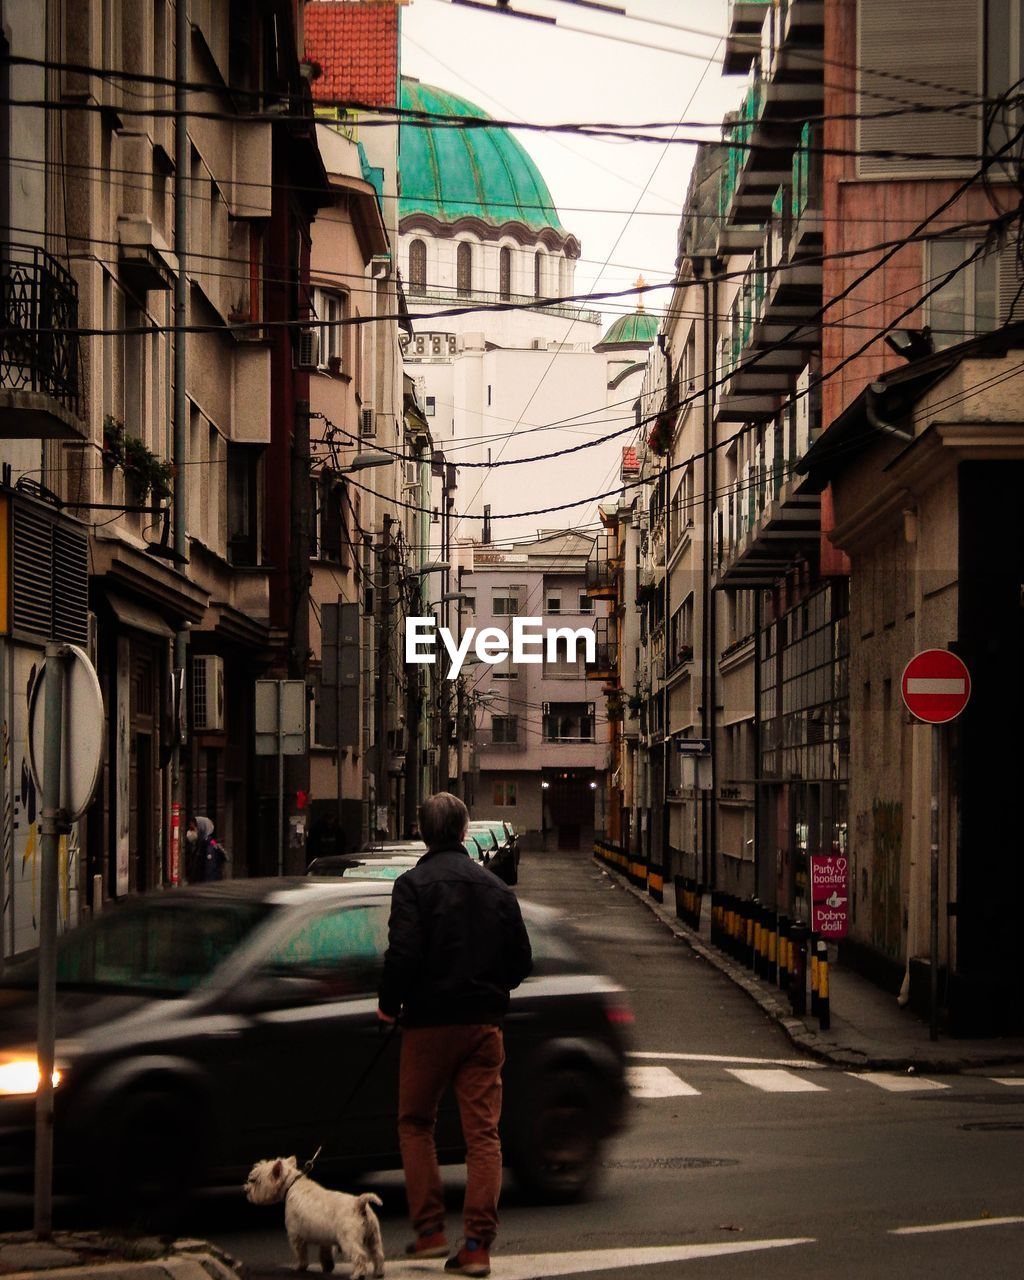 REAR VIEW OF MAN WALKING ON STREET BY BUILDINGS IN CITY